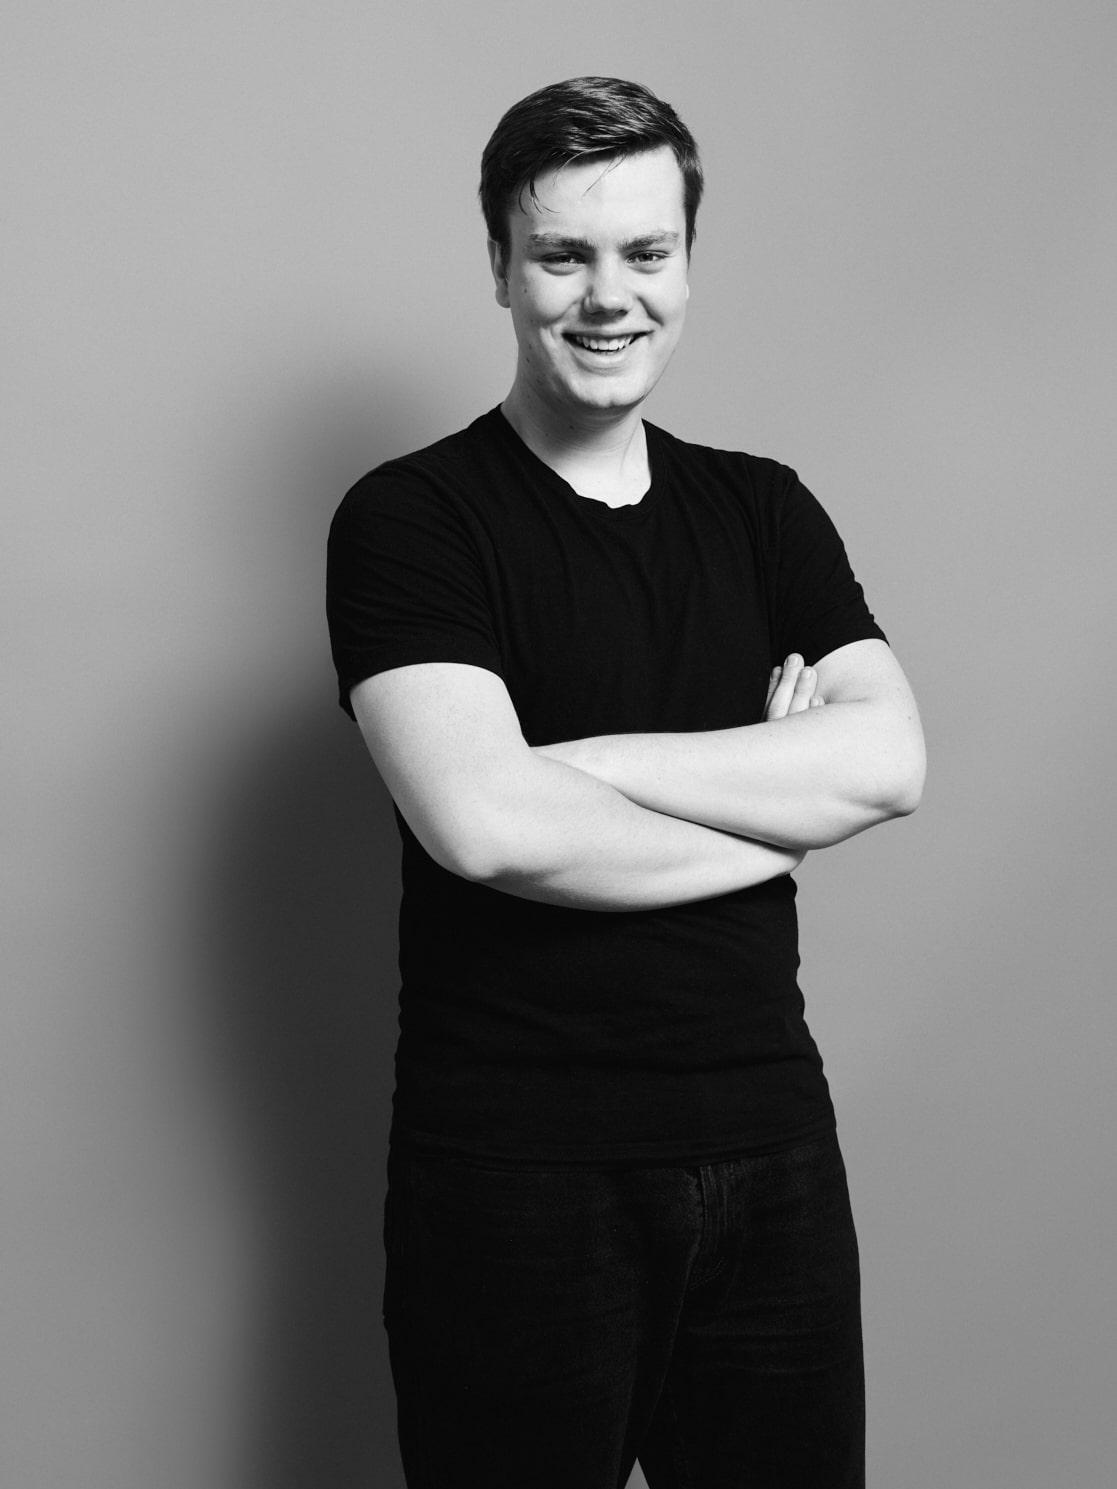 Daniel Westermann